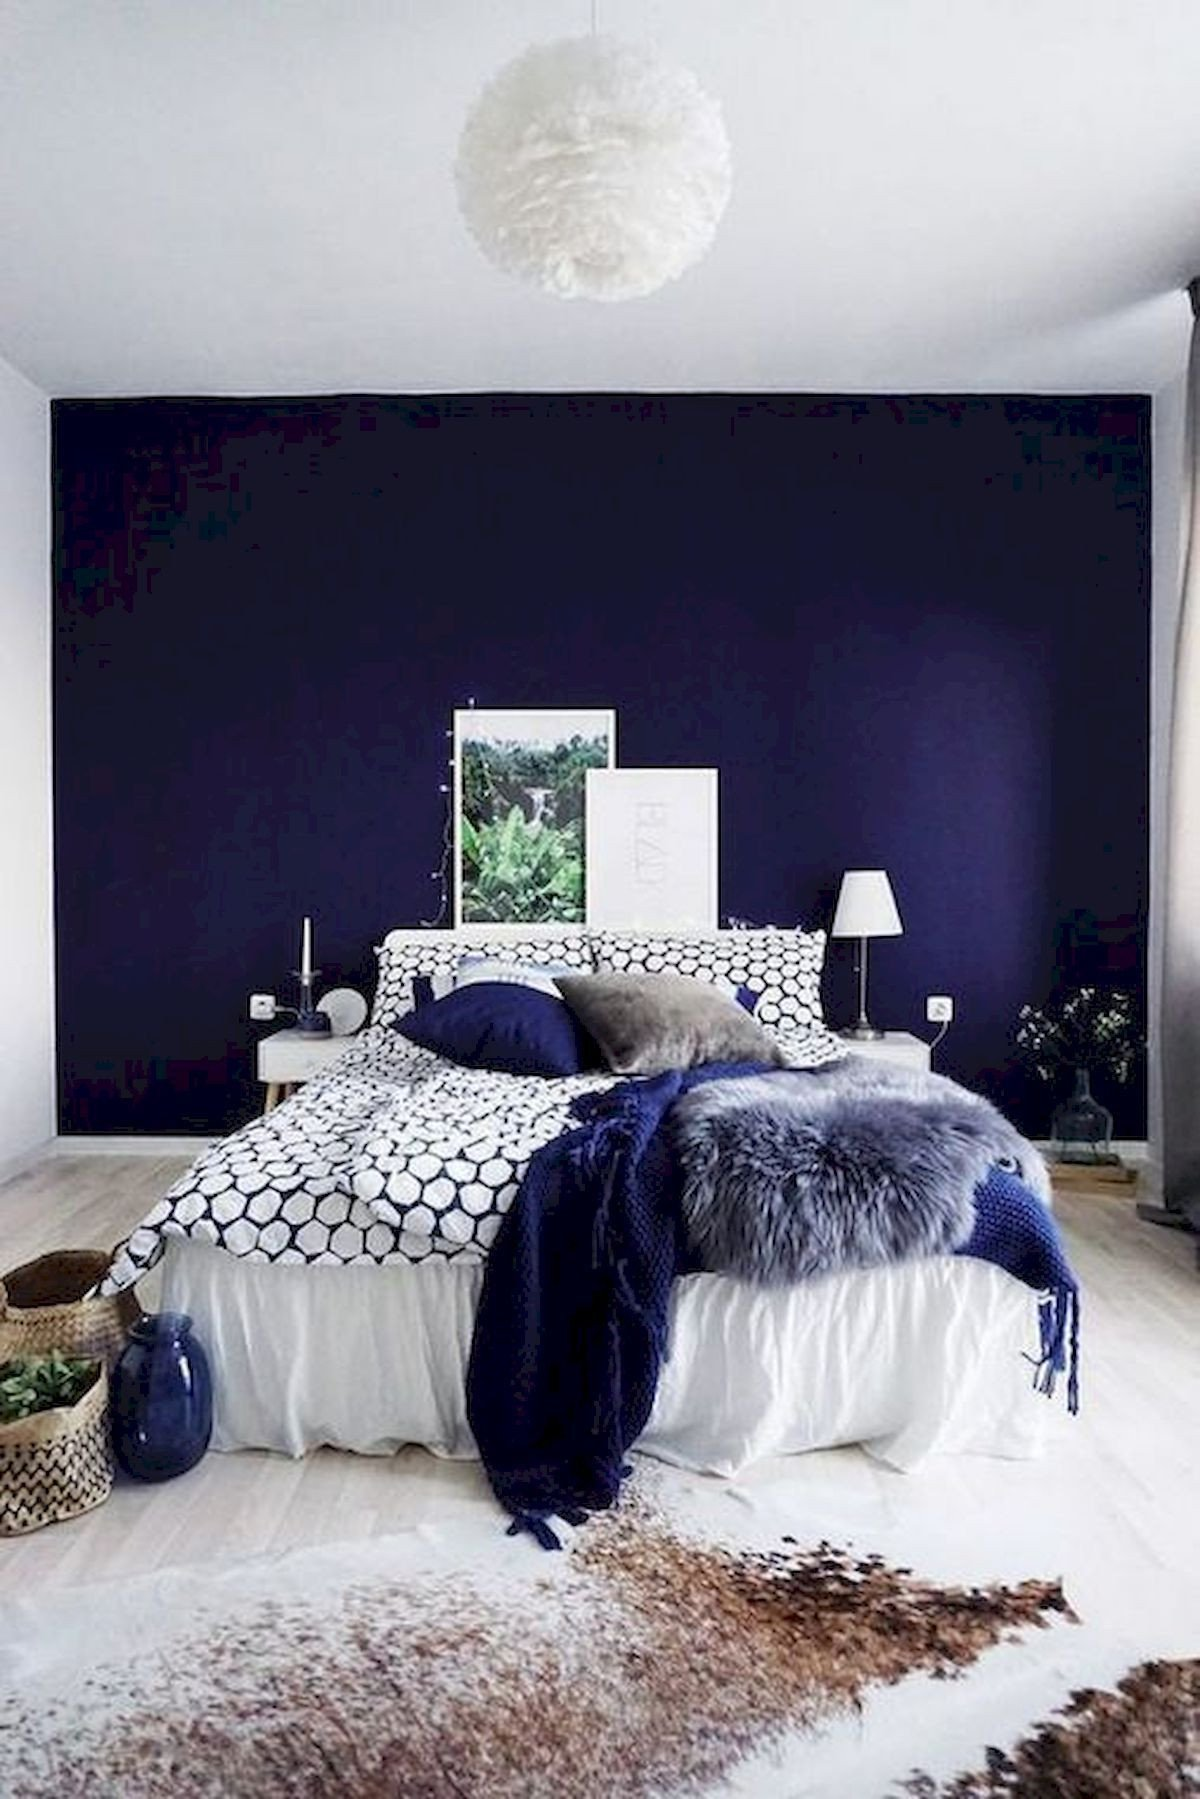 Sofia Vergara Bedroom Set Luxury Tips for Spectacular sofia Vergara White Bedroom Set Only In